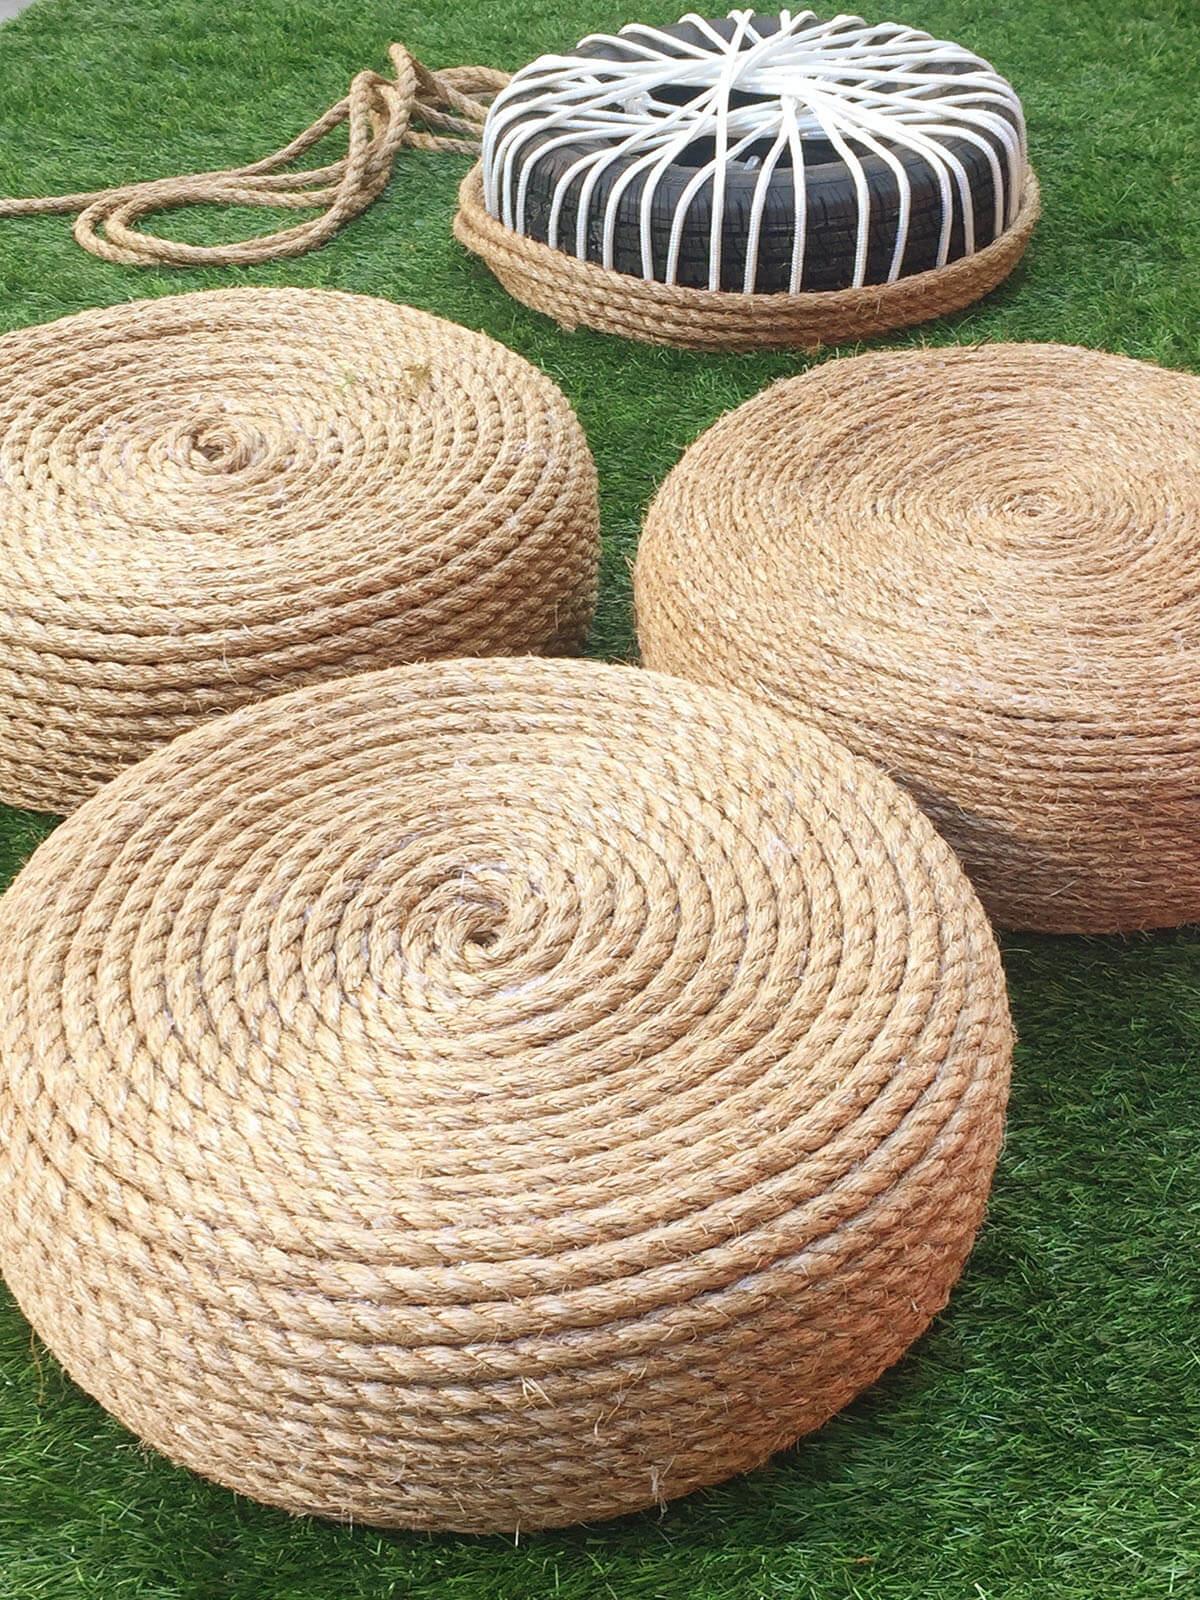 Backyard Projects: 15 Amazing DIY Outdoor Decor Ideas ... on Easy Diy Garden Decor id=49073